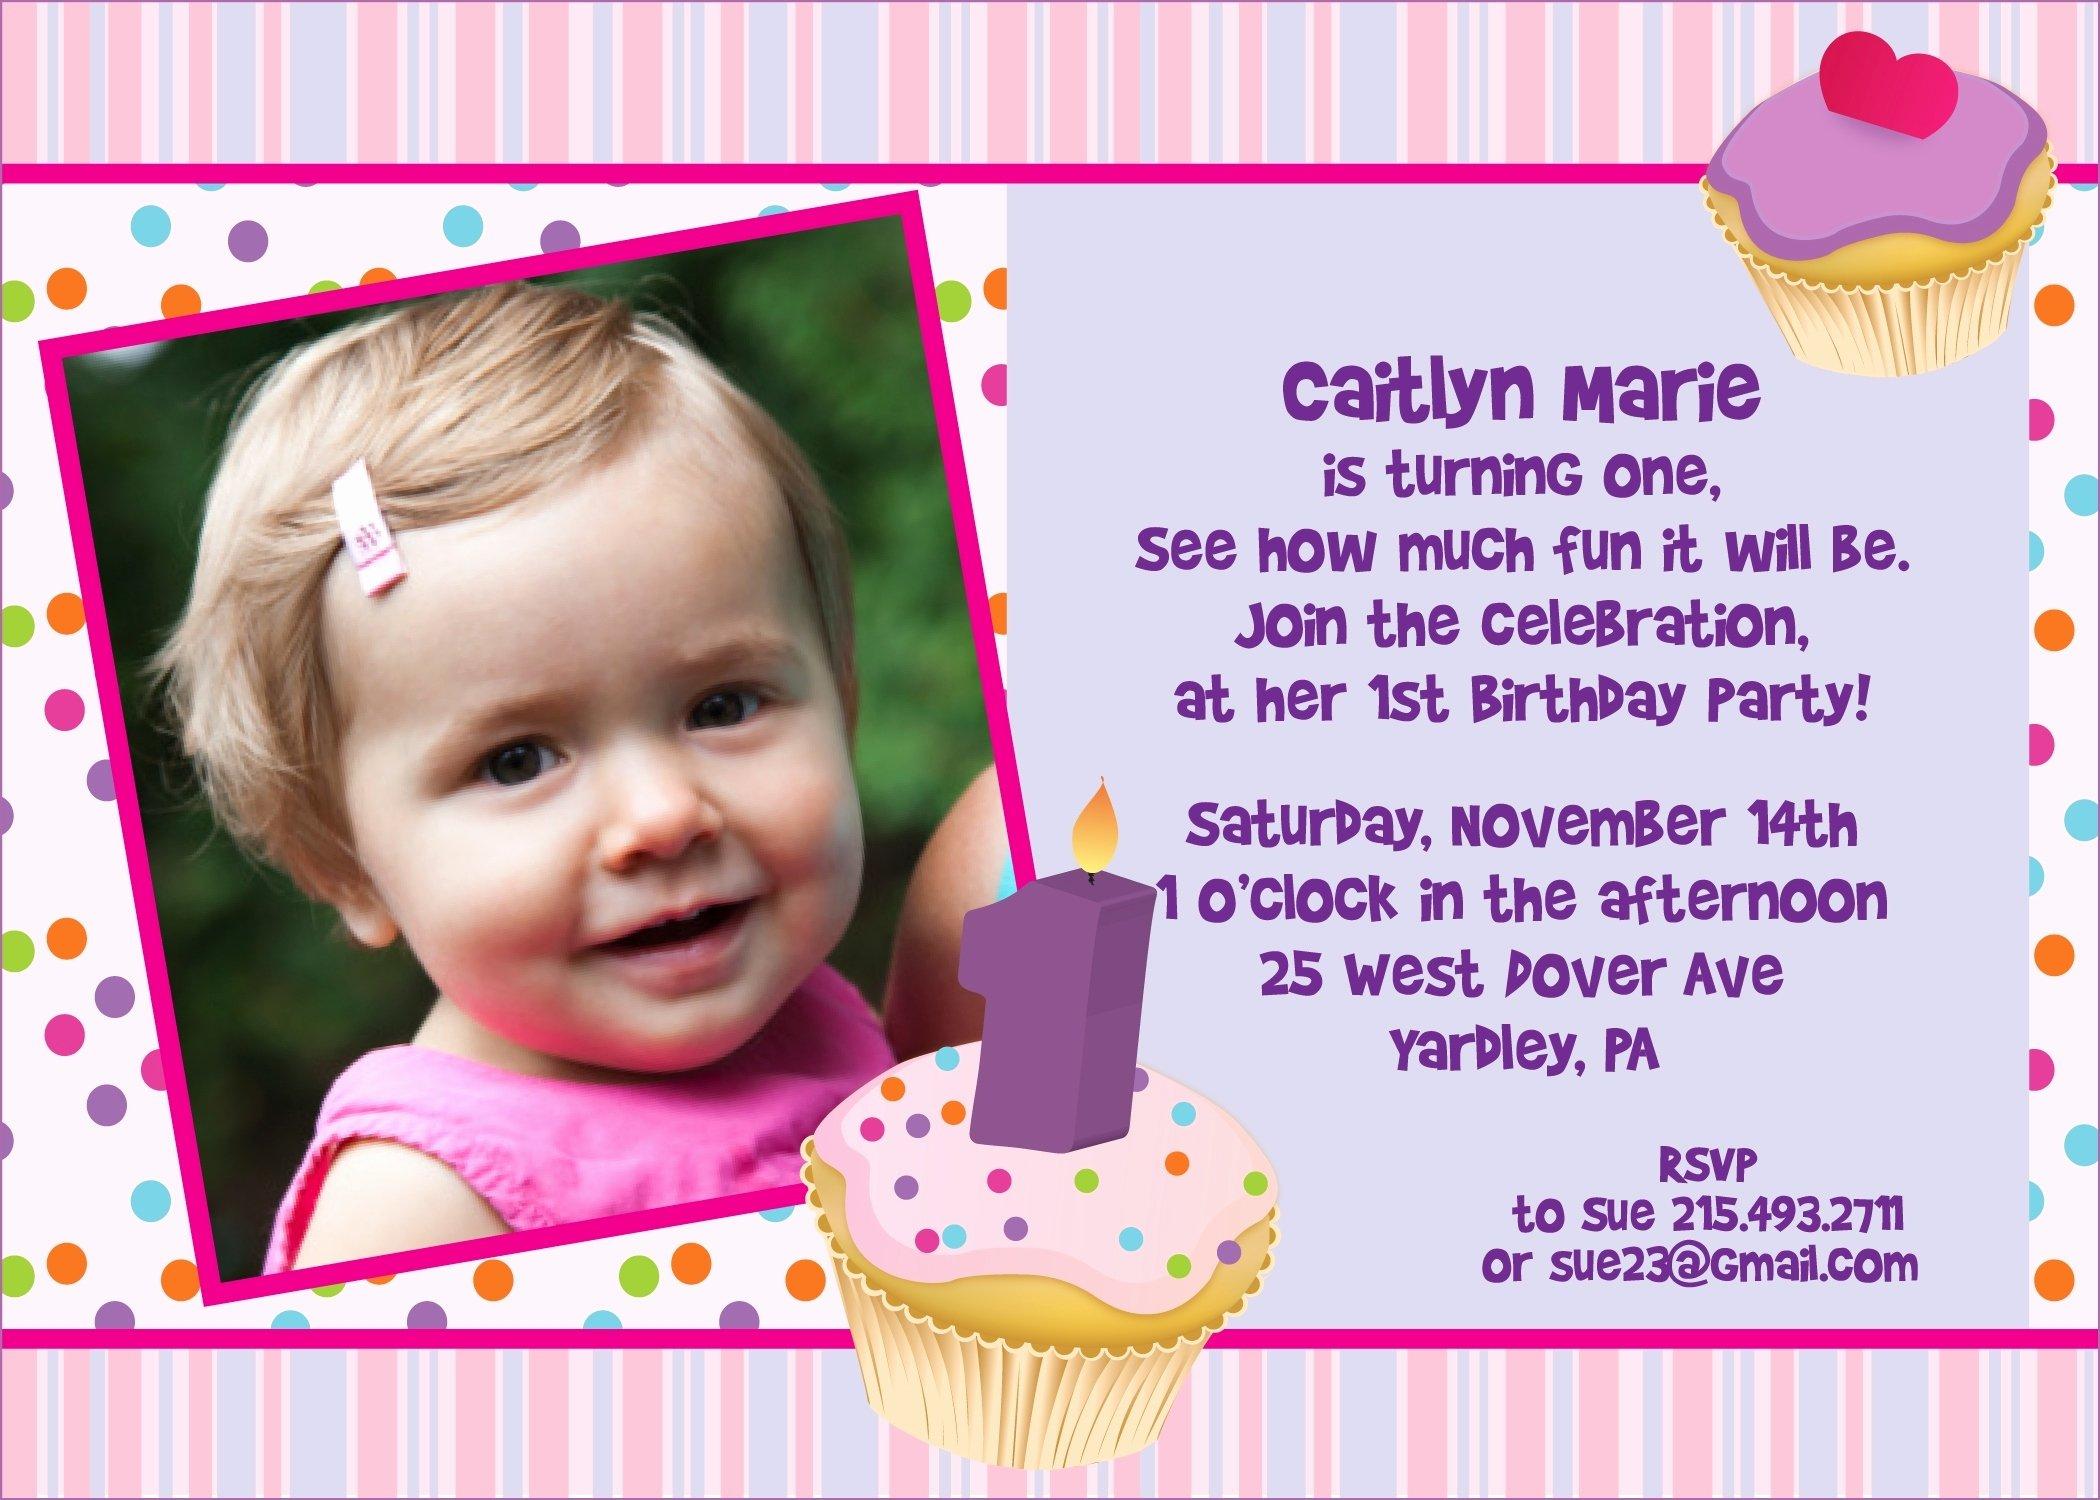 1st Birthday Invitation Wording Samples Lovely Sample Invitation for 1st Birthday Party Cobypic